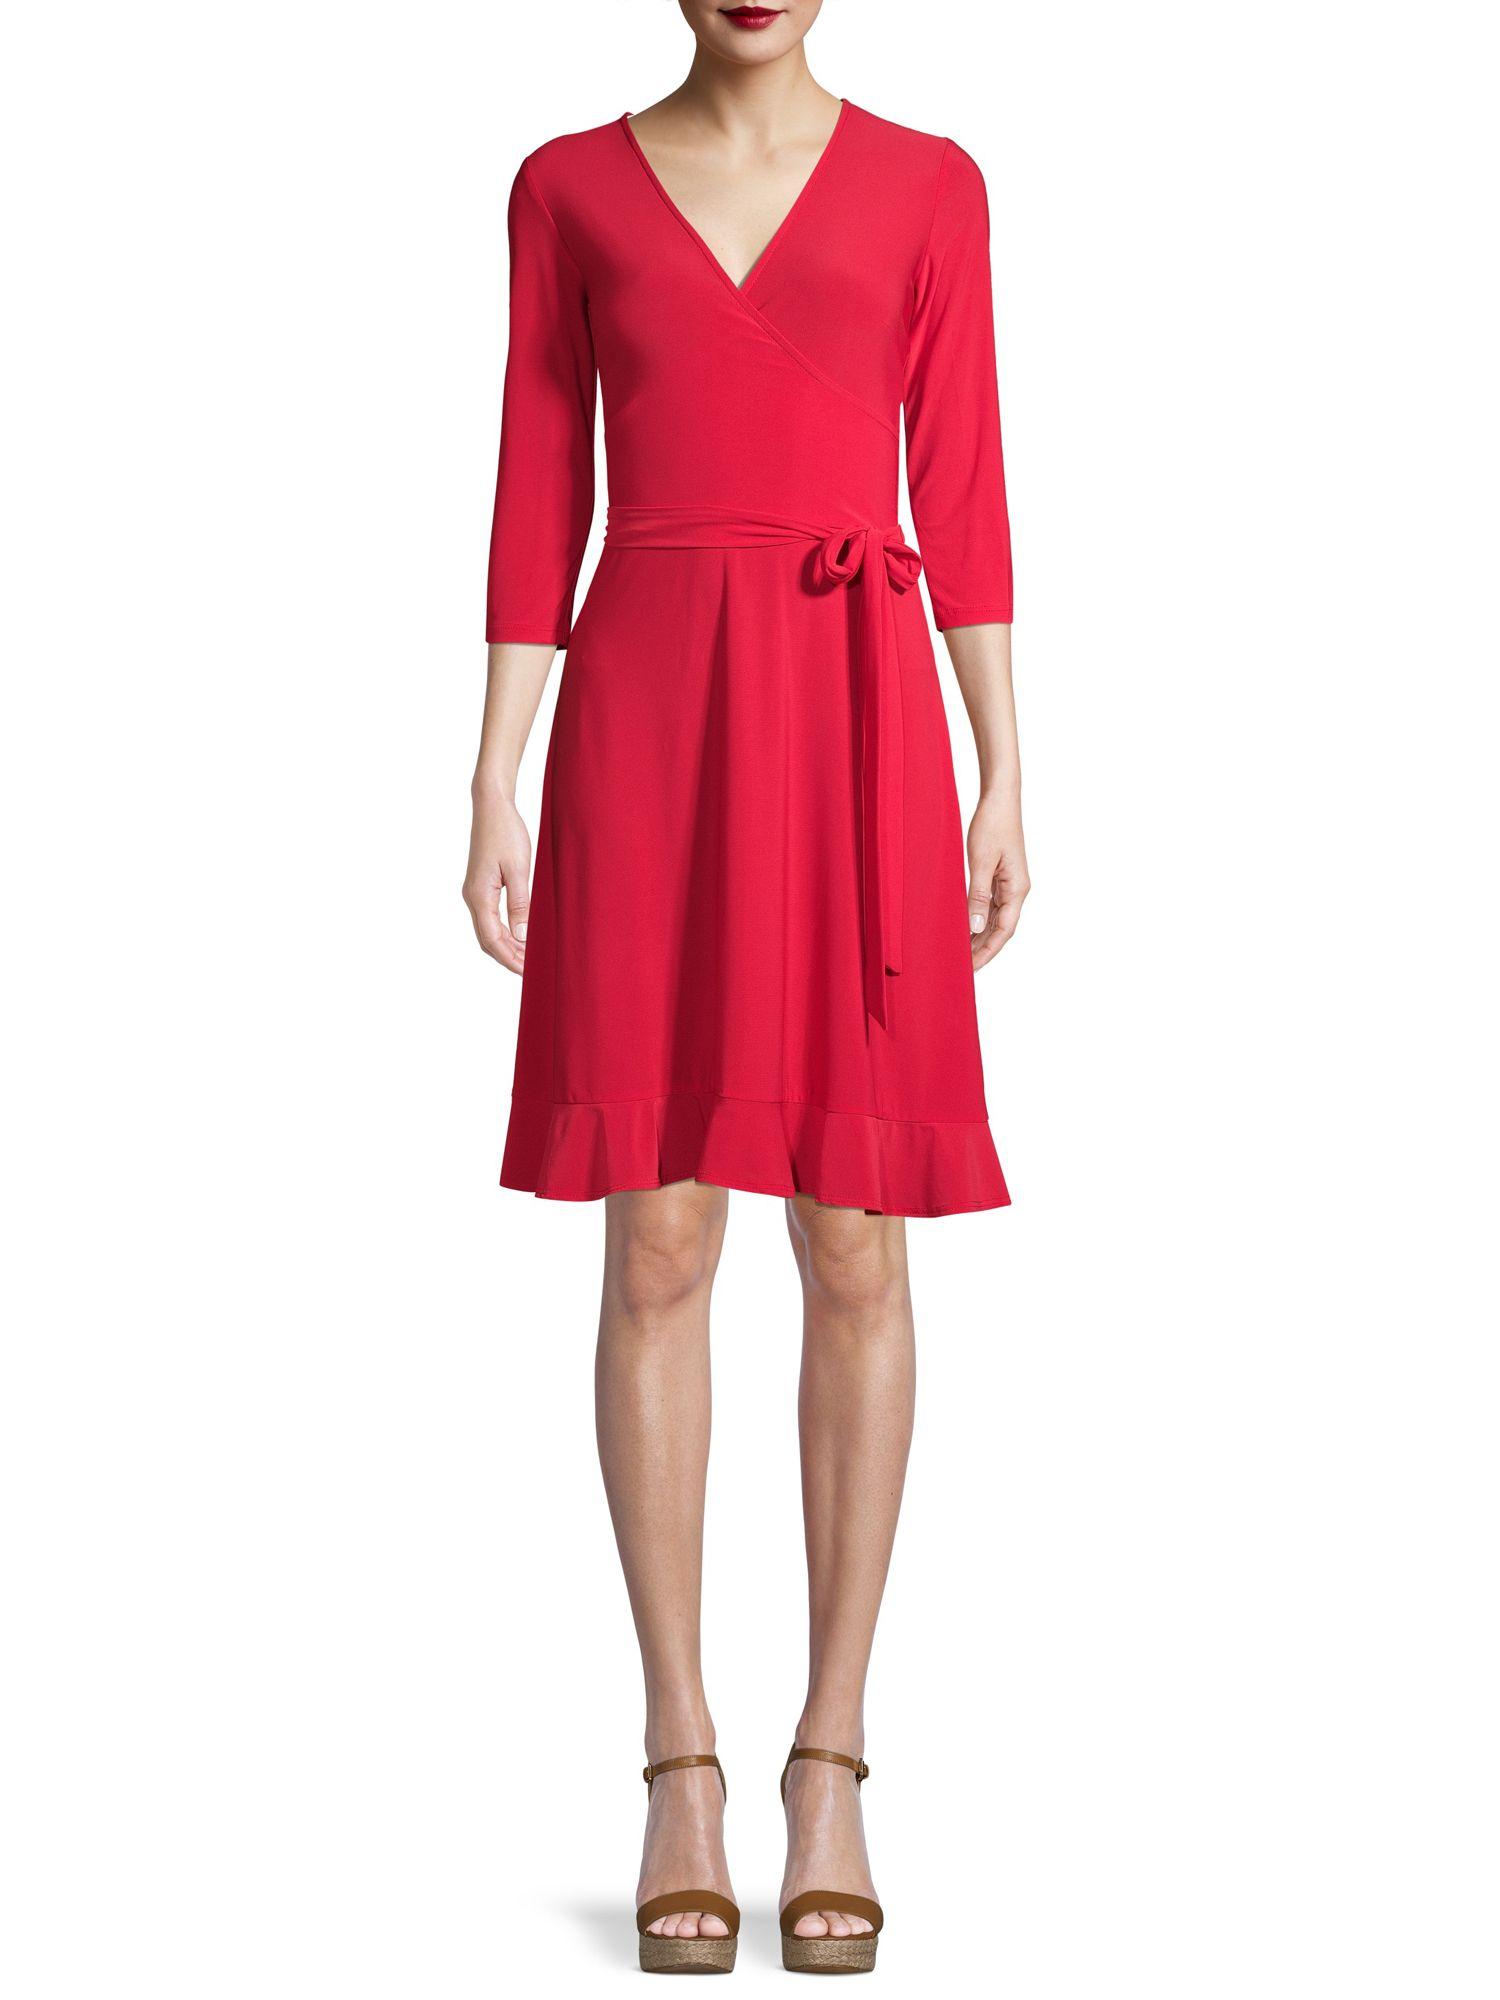 Attitude Unknown Women S Wrap Front Dress Walmart Com Wrap Front Dress Red Flare Dress Dresses [ 2000 x 1500 Pixel ]